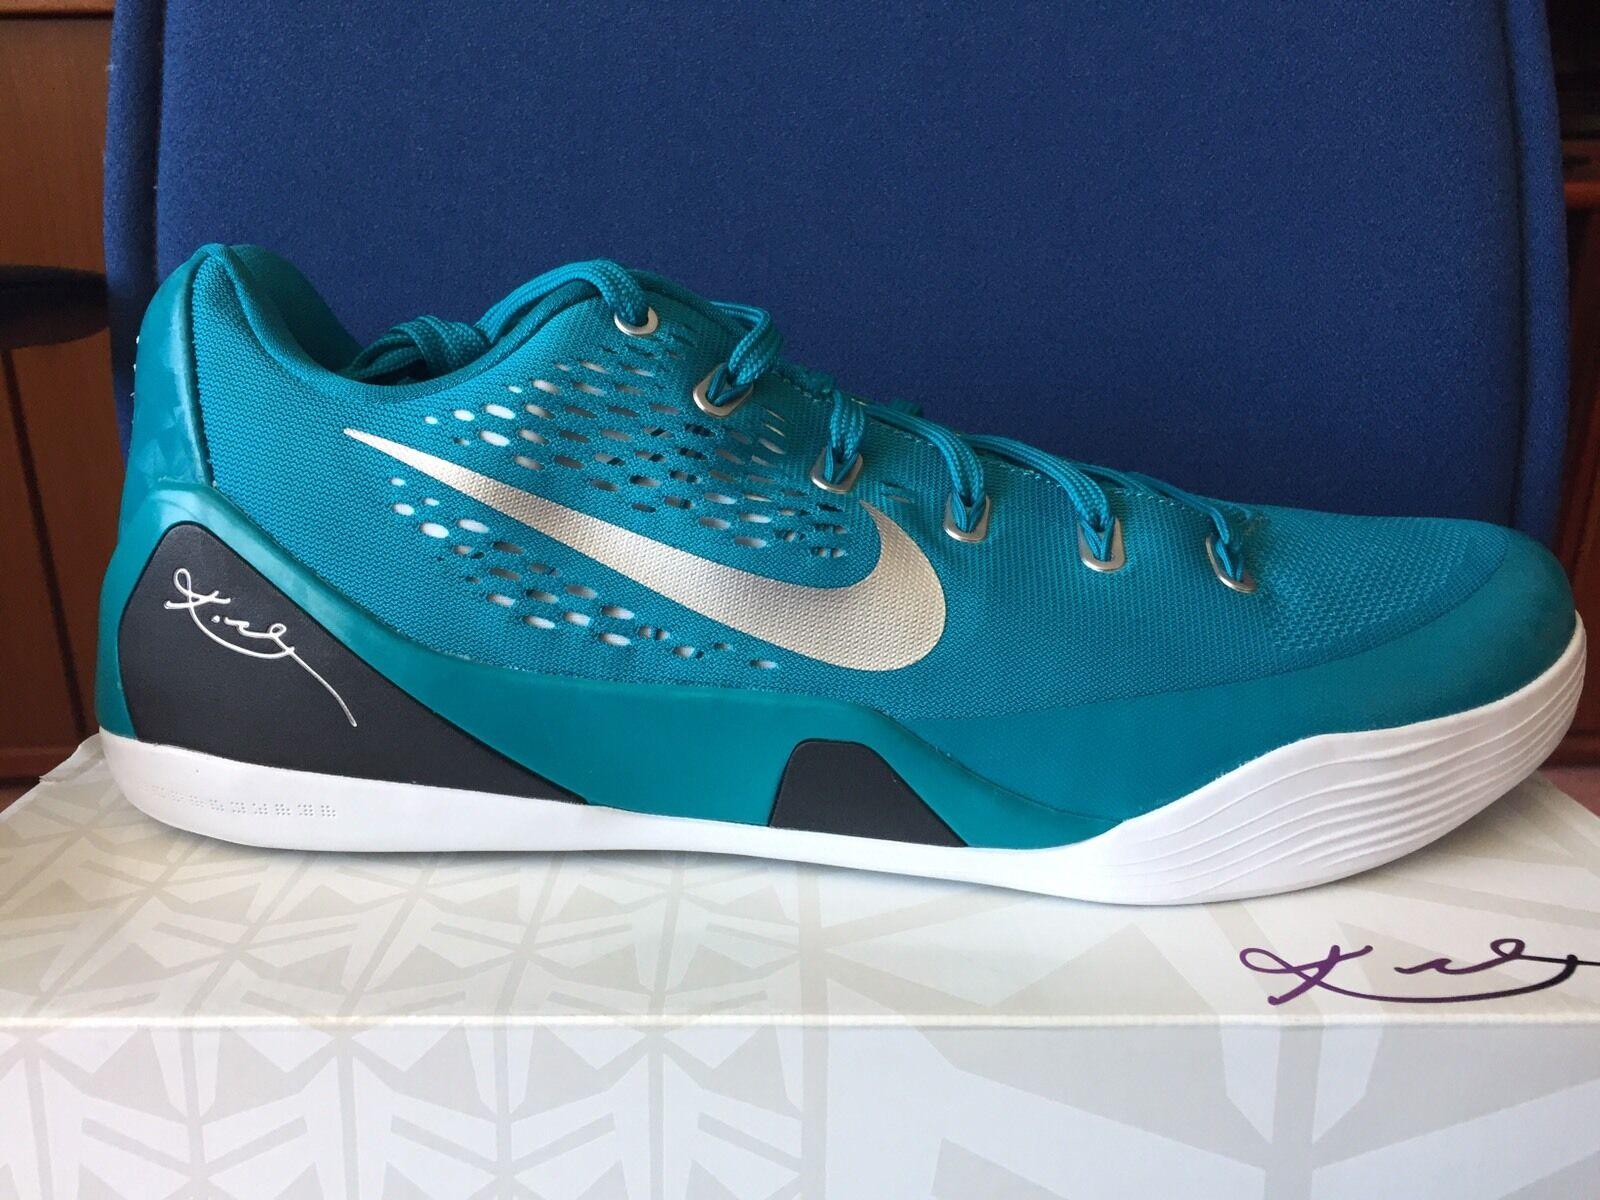 Nike Kobe IX EM TB Tropical Teal Sz 16 Bryant Mens Basketball Shoes X Air Jordan